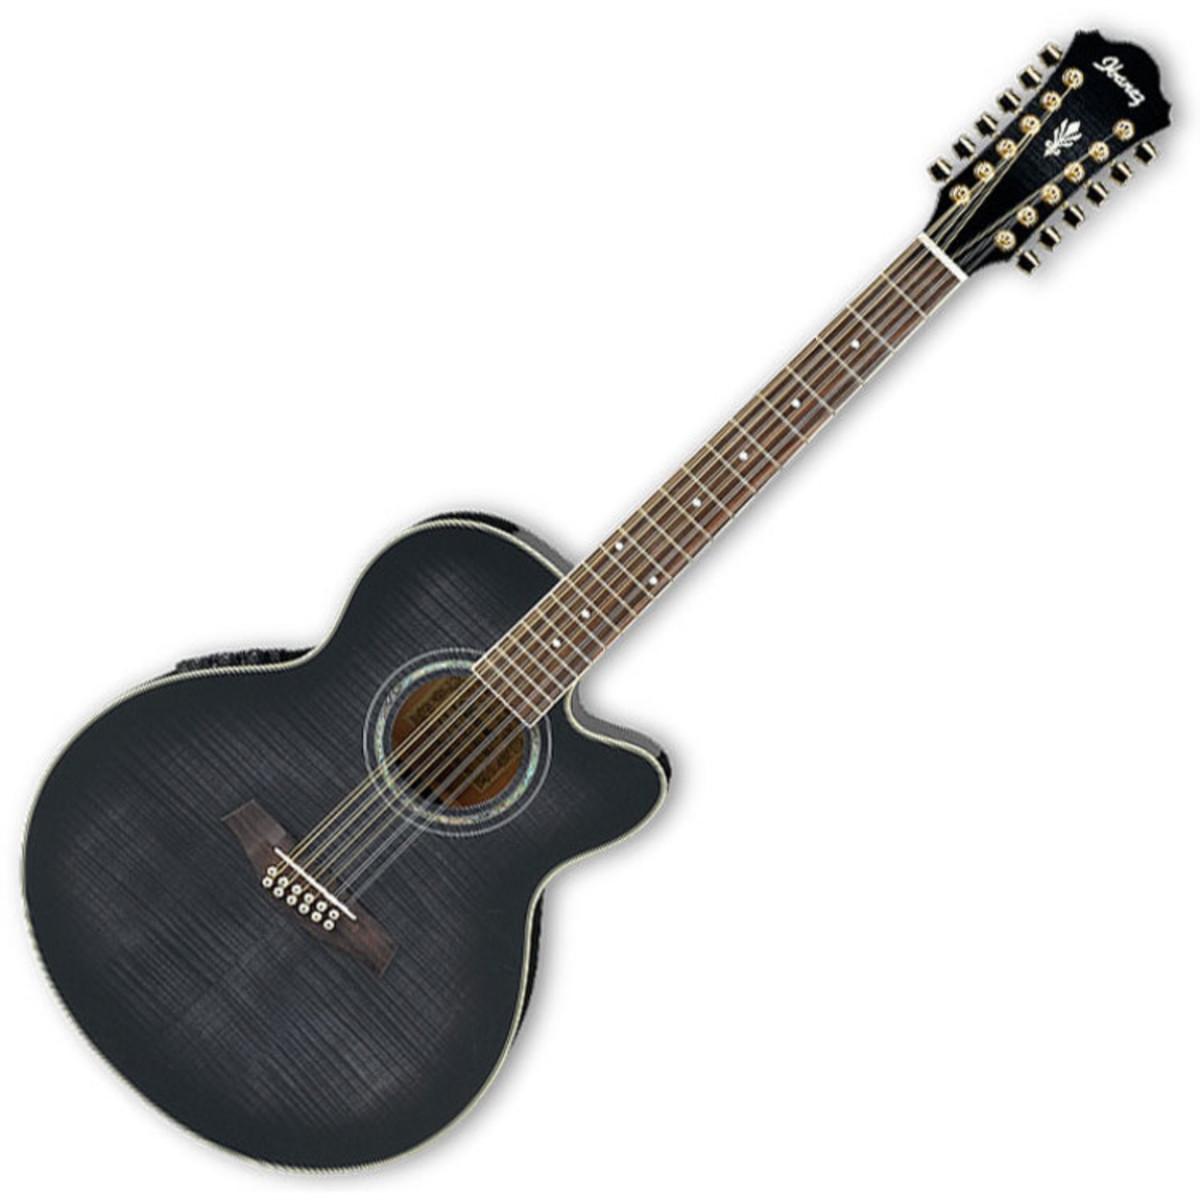 029 suuntanumero ibanez kitarat